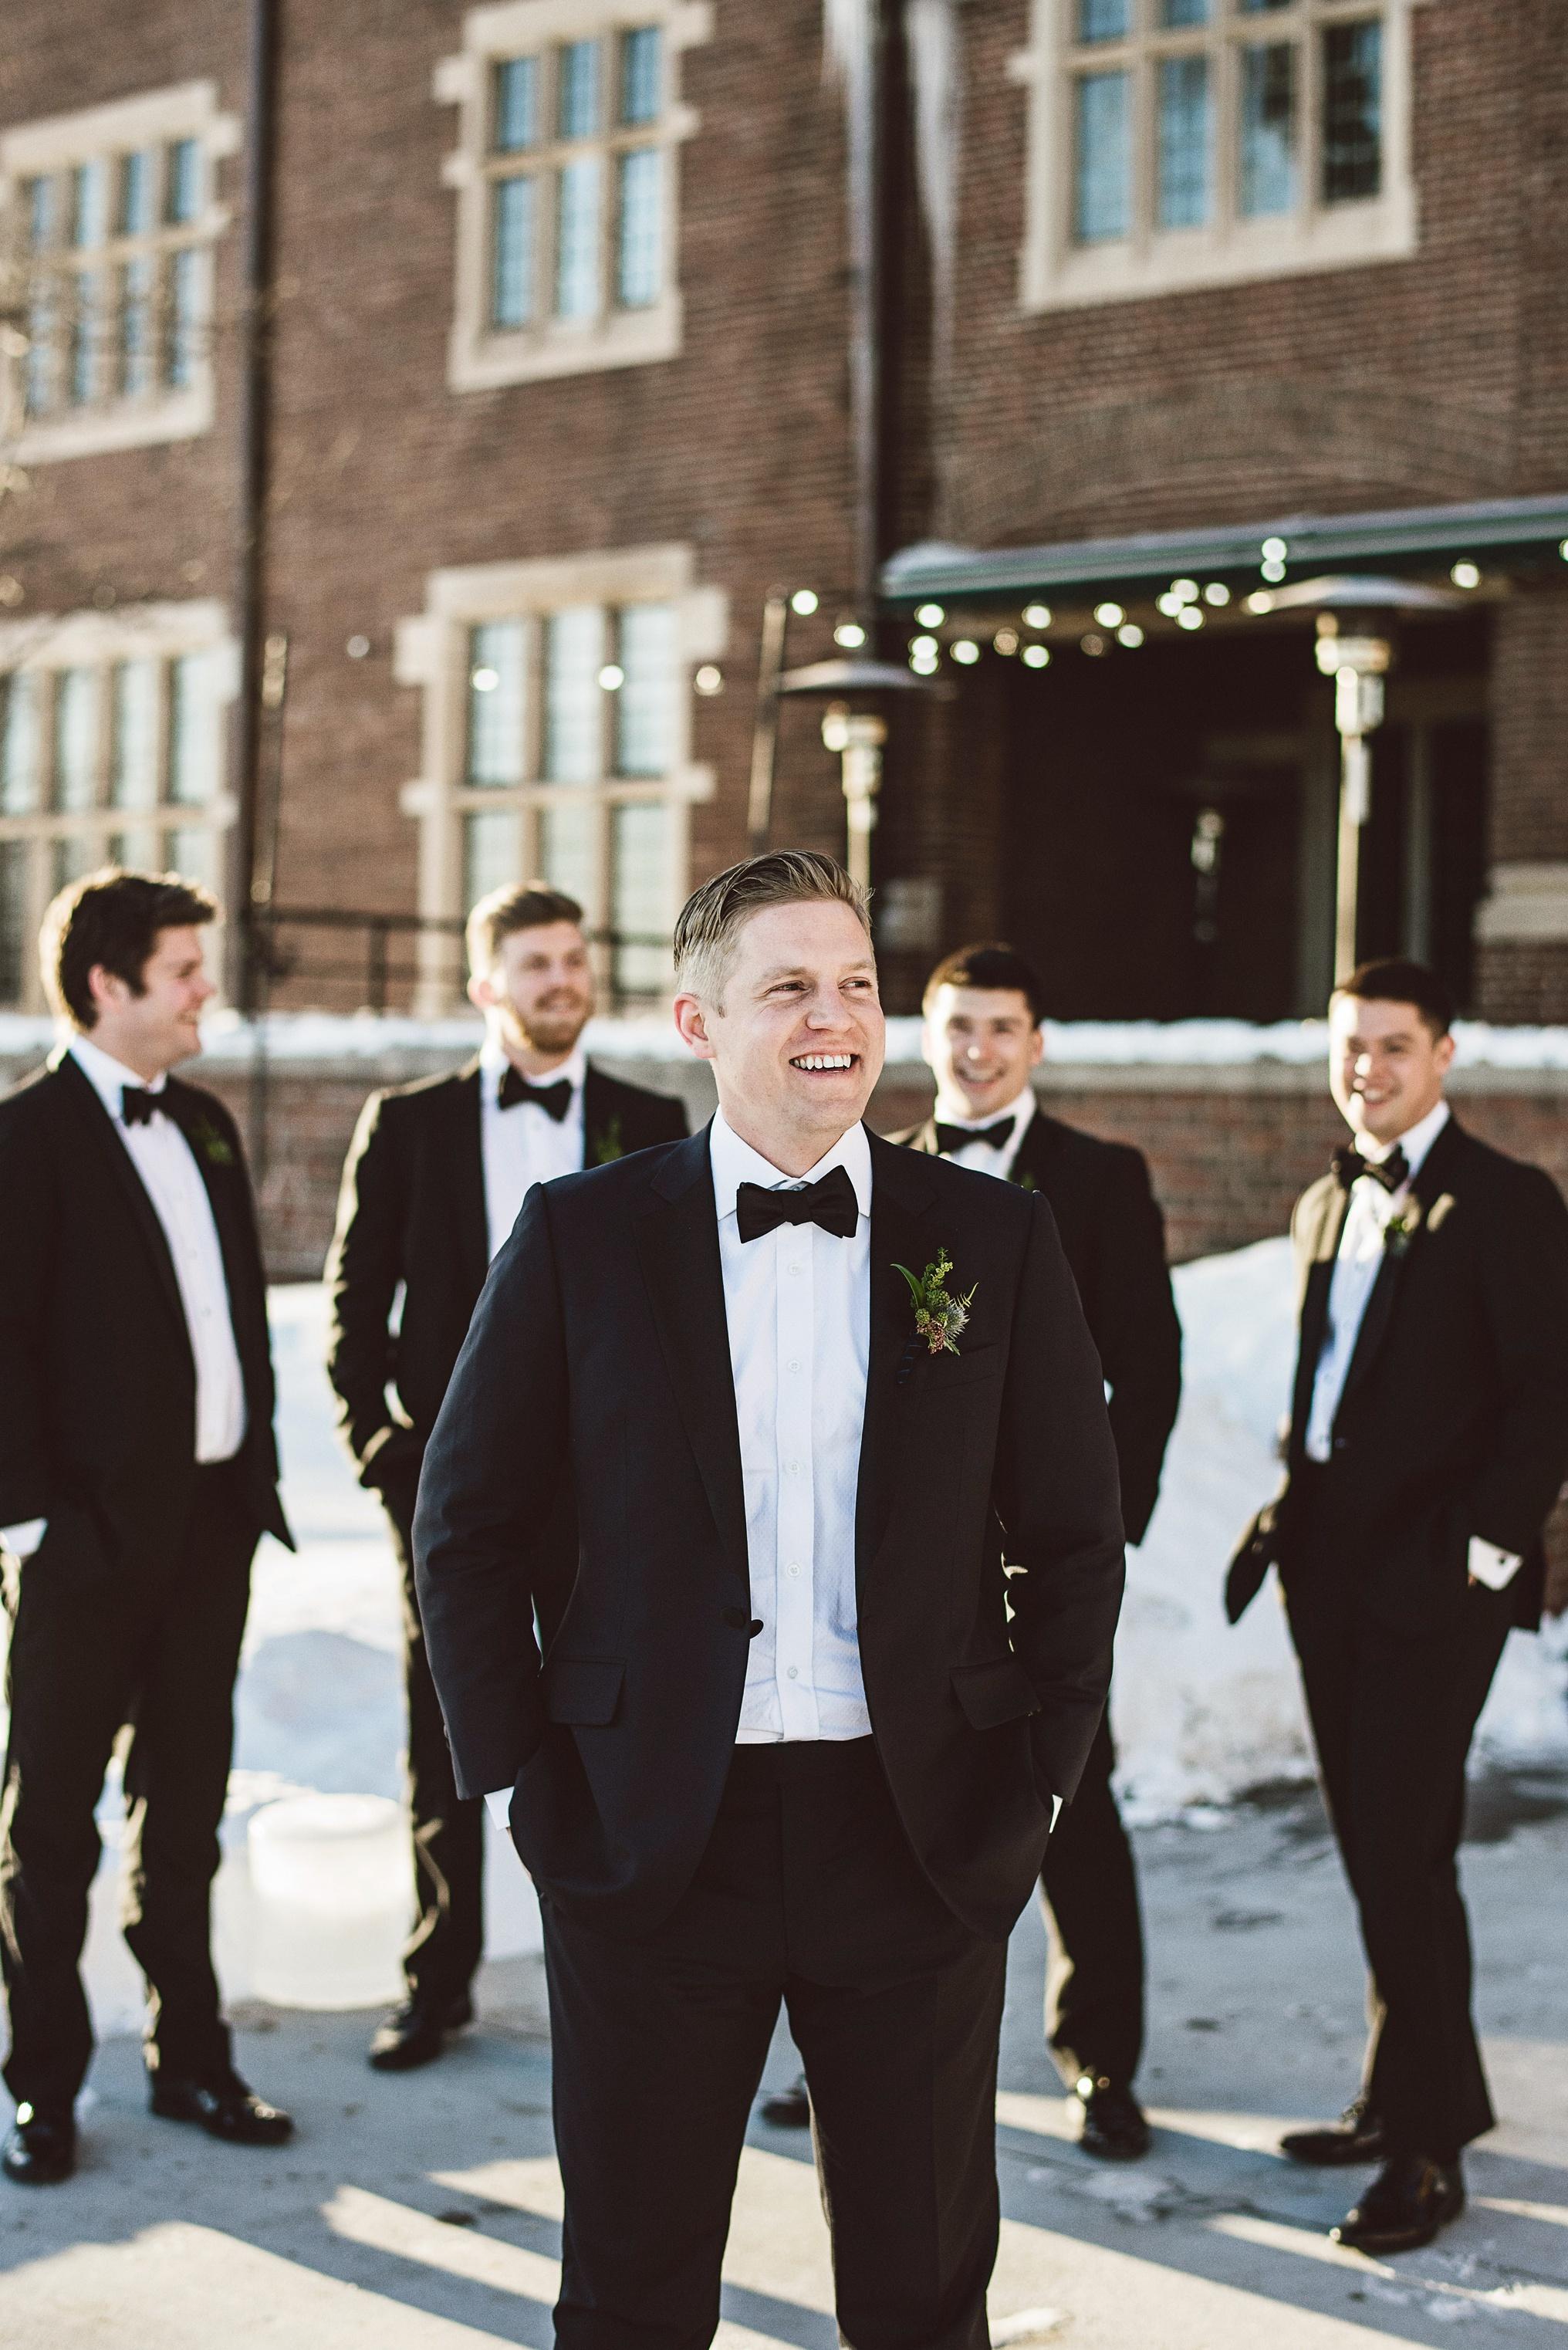 best_wedding_photography_2017_by_lucas_botz_photography_171.jpg